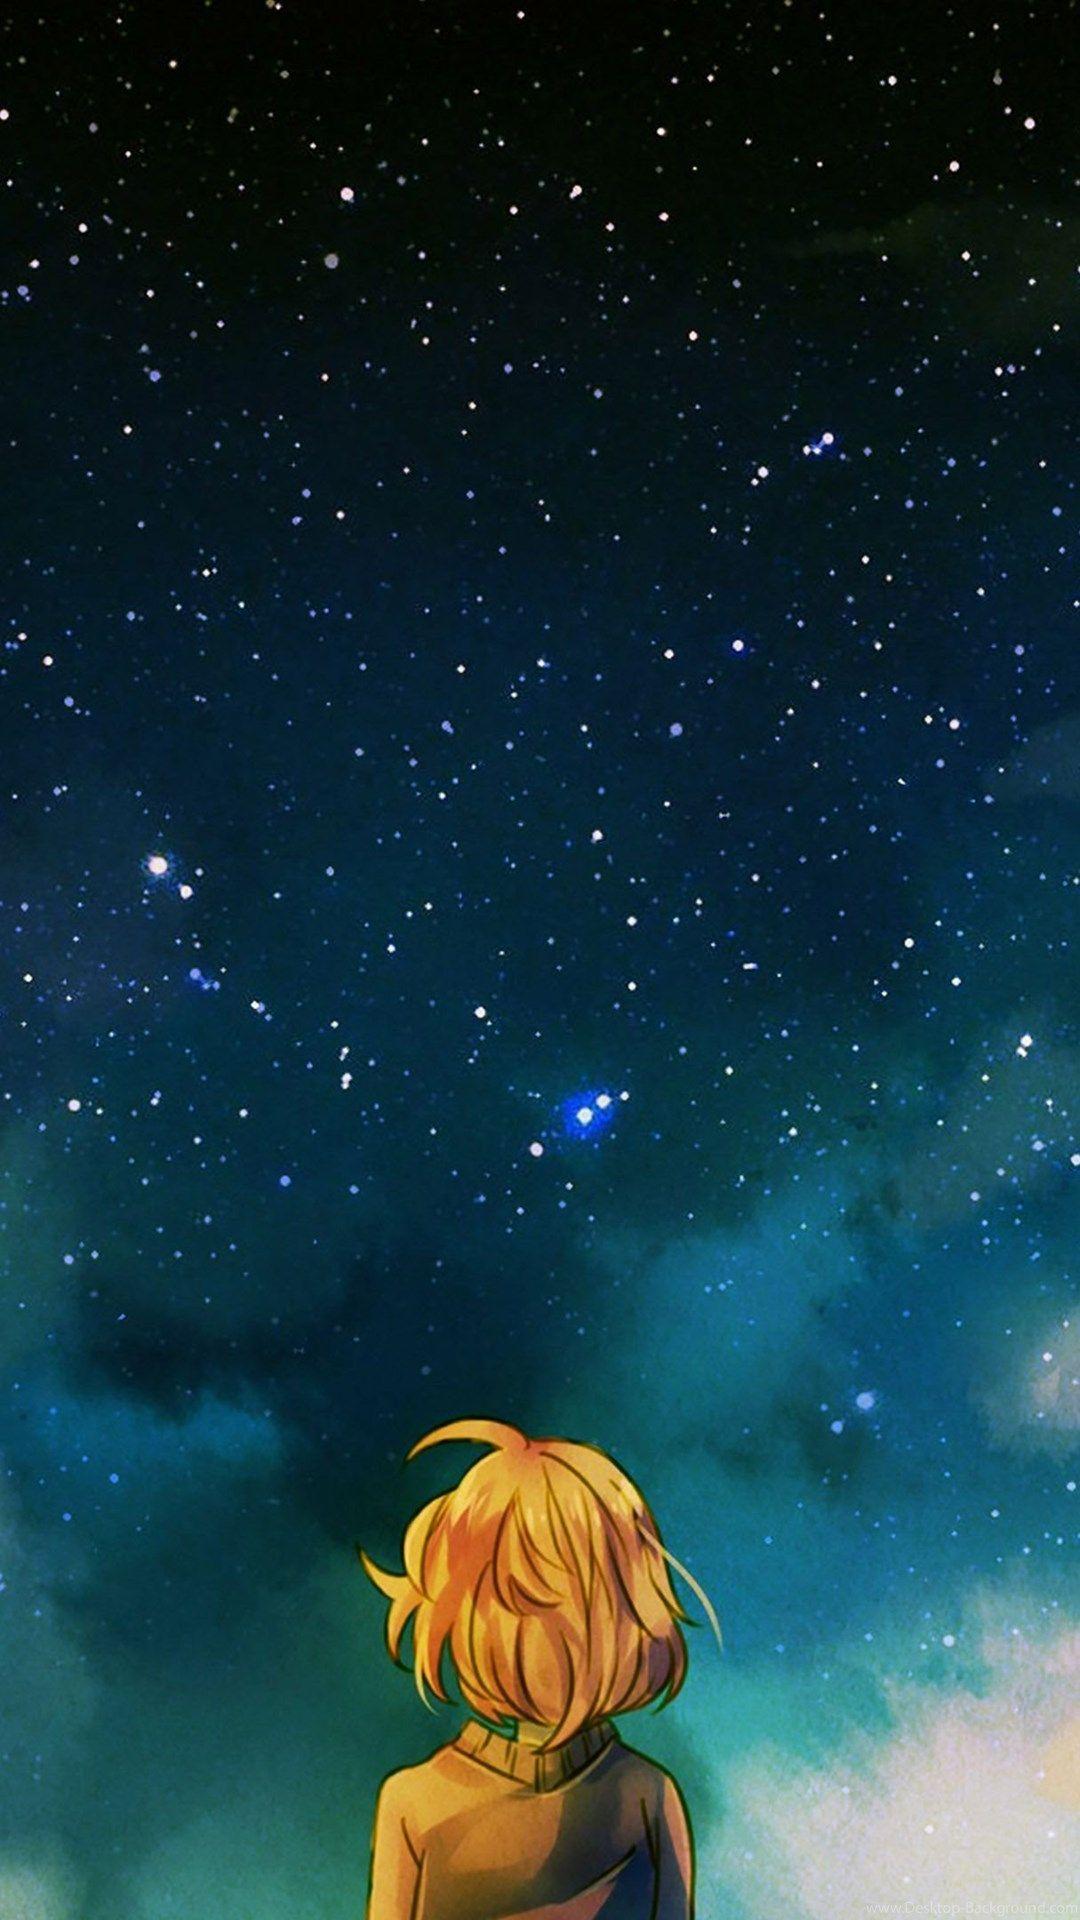 Sad Anime good wallpaper for iPhone